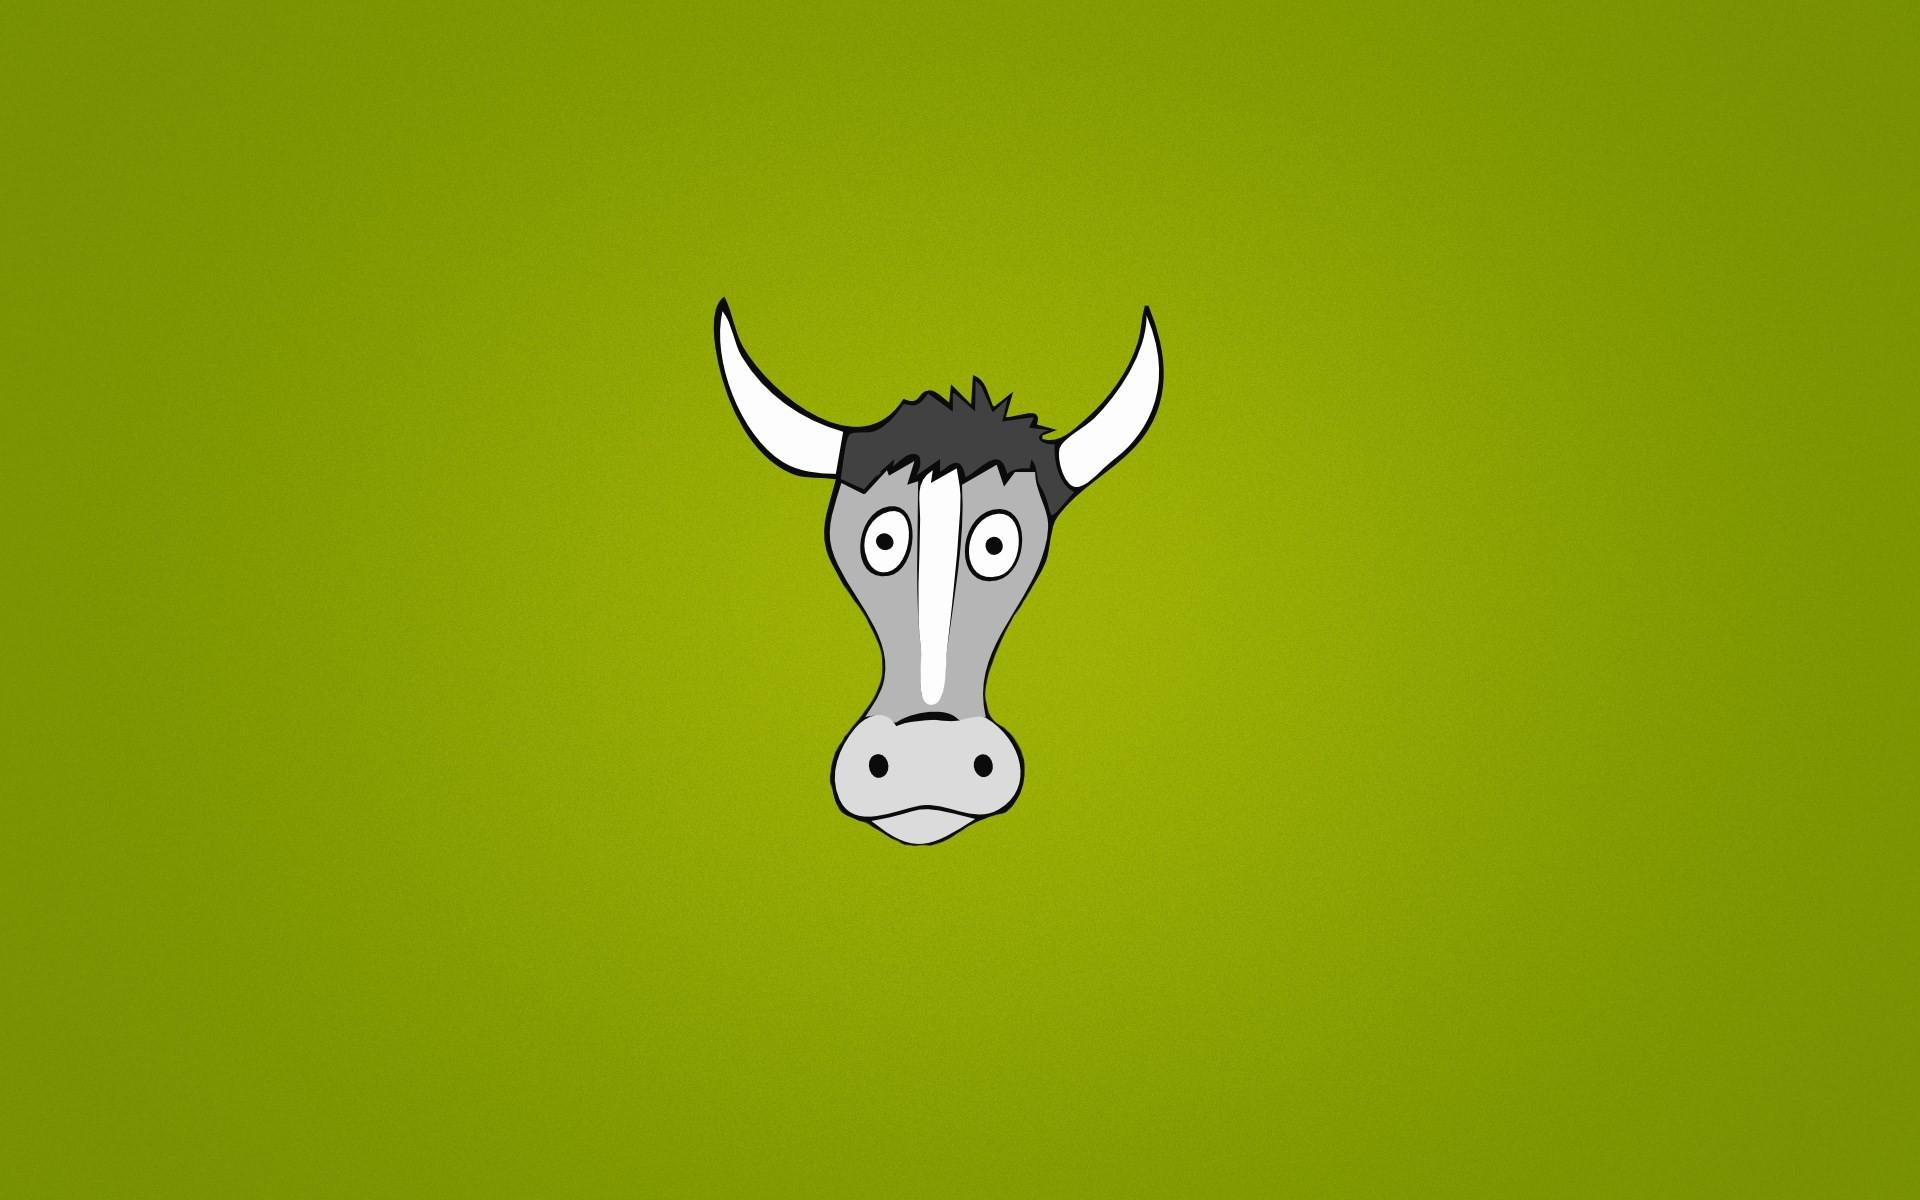 Cow Goggle-eyed Funny Cartoon